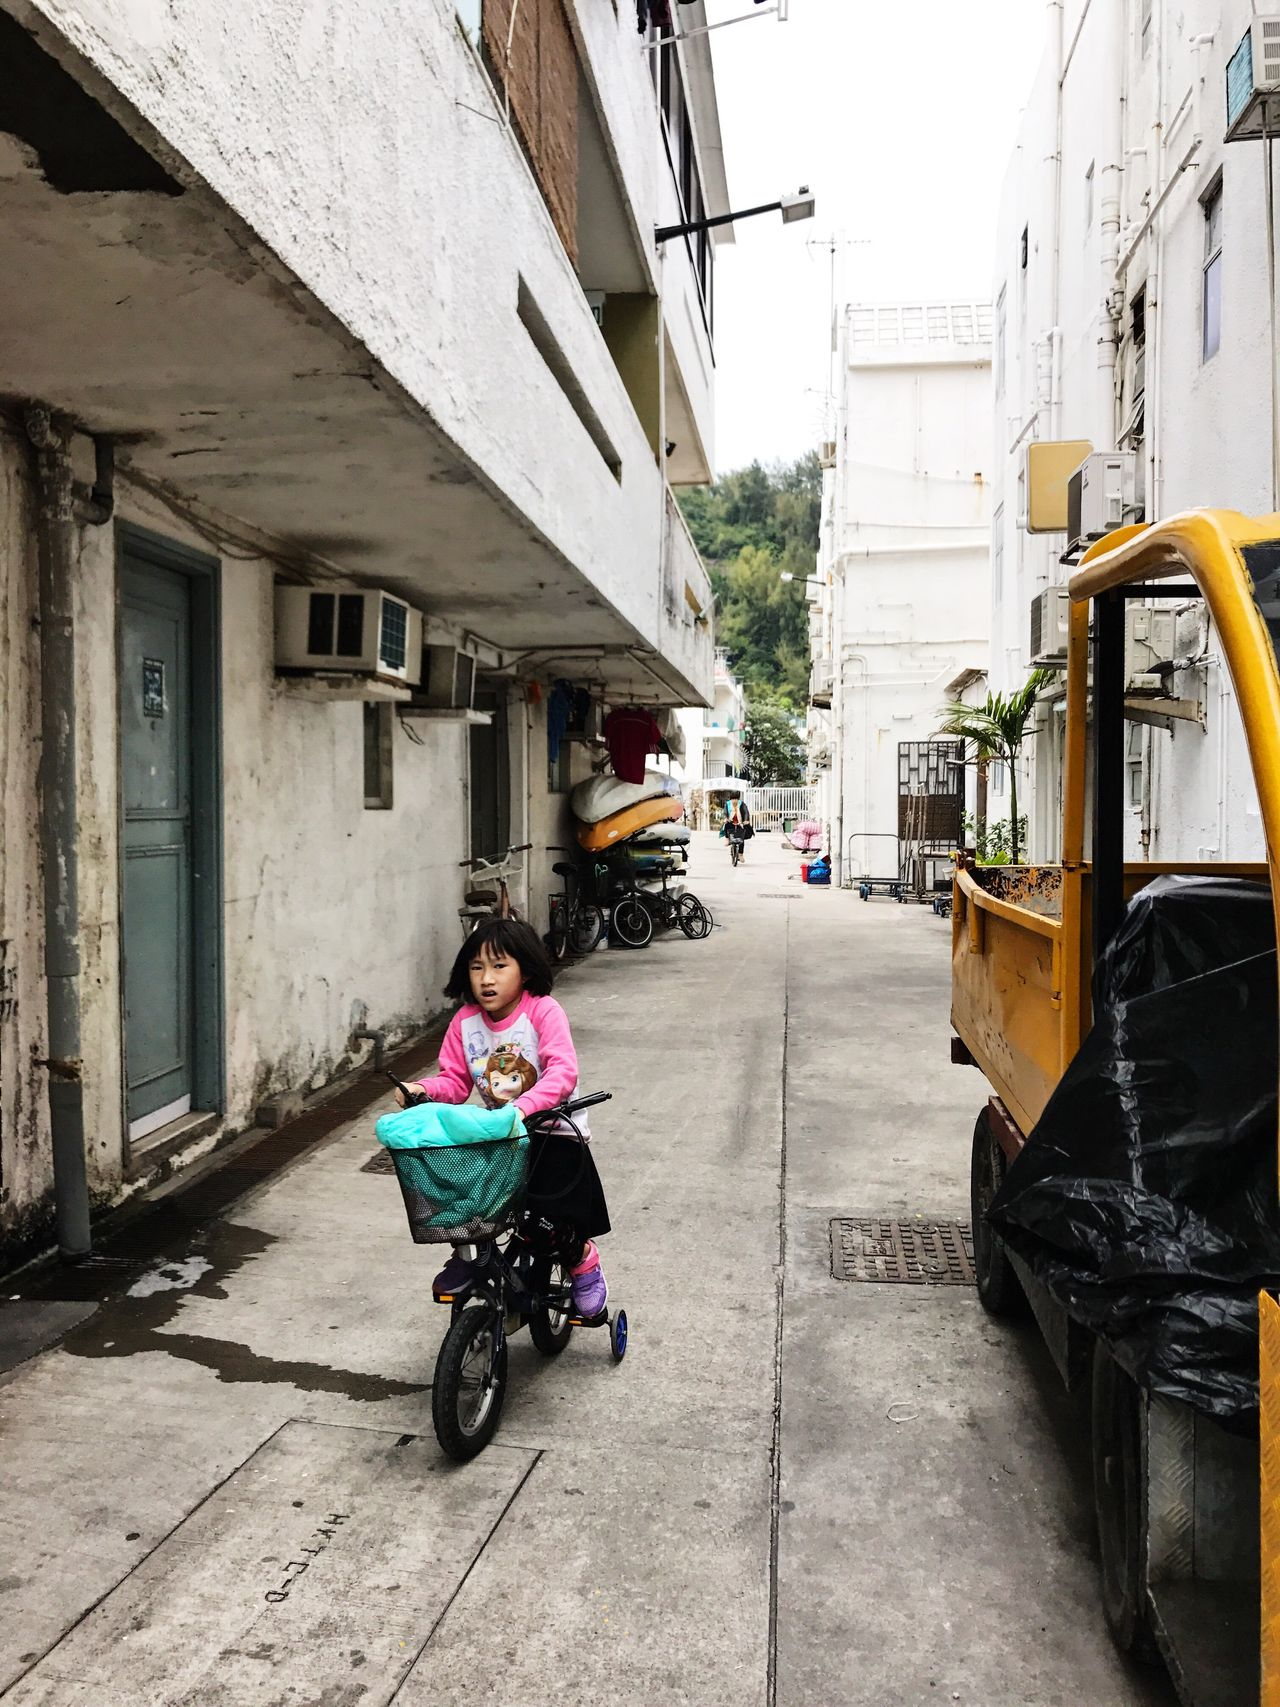 IPhone IPhone7Plus Street The Street Photographer - 2017 EyeEm Awards The Street Photographer HongKong Hong Kong The Photojournalist - 2017 EyeEm Awards